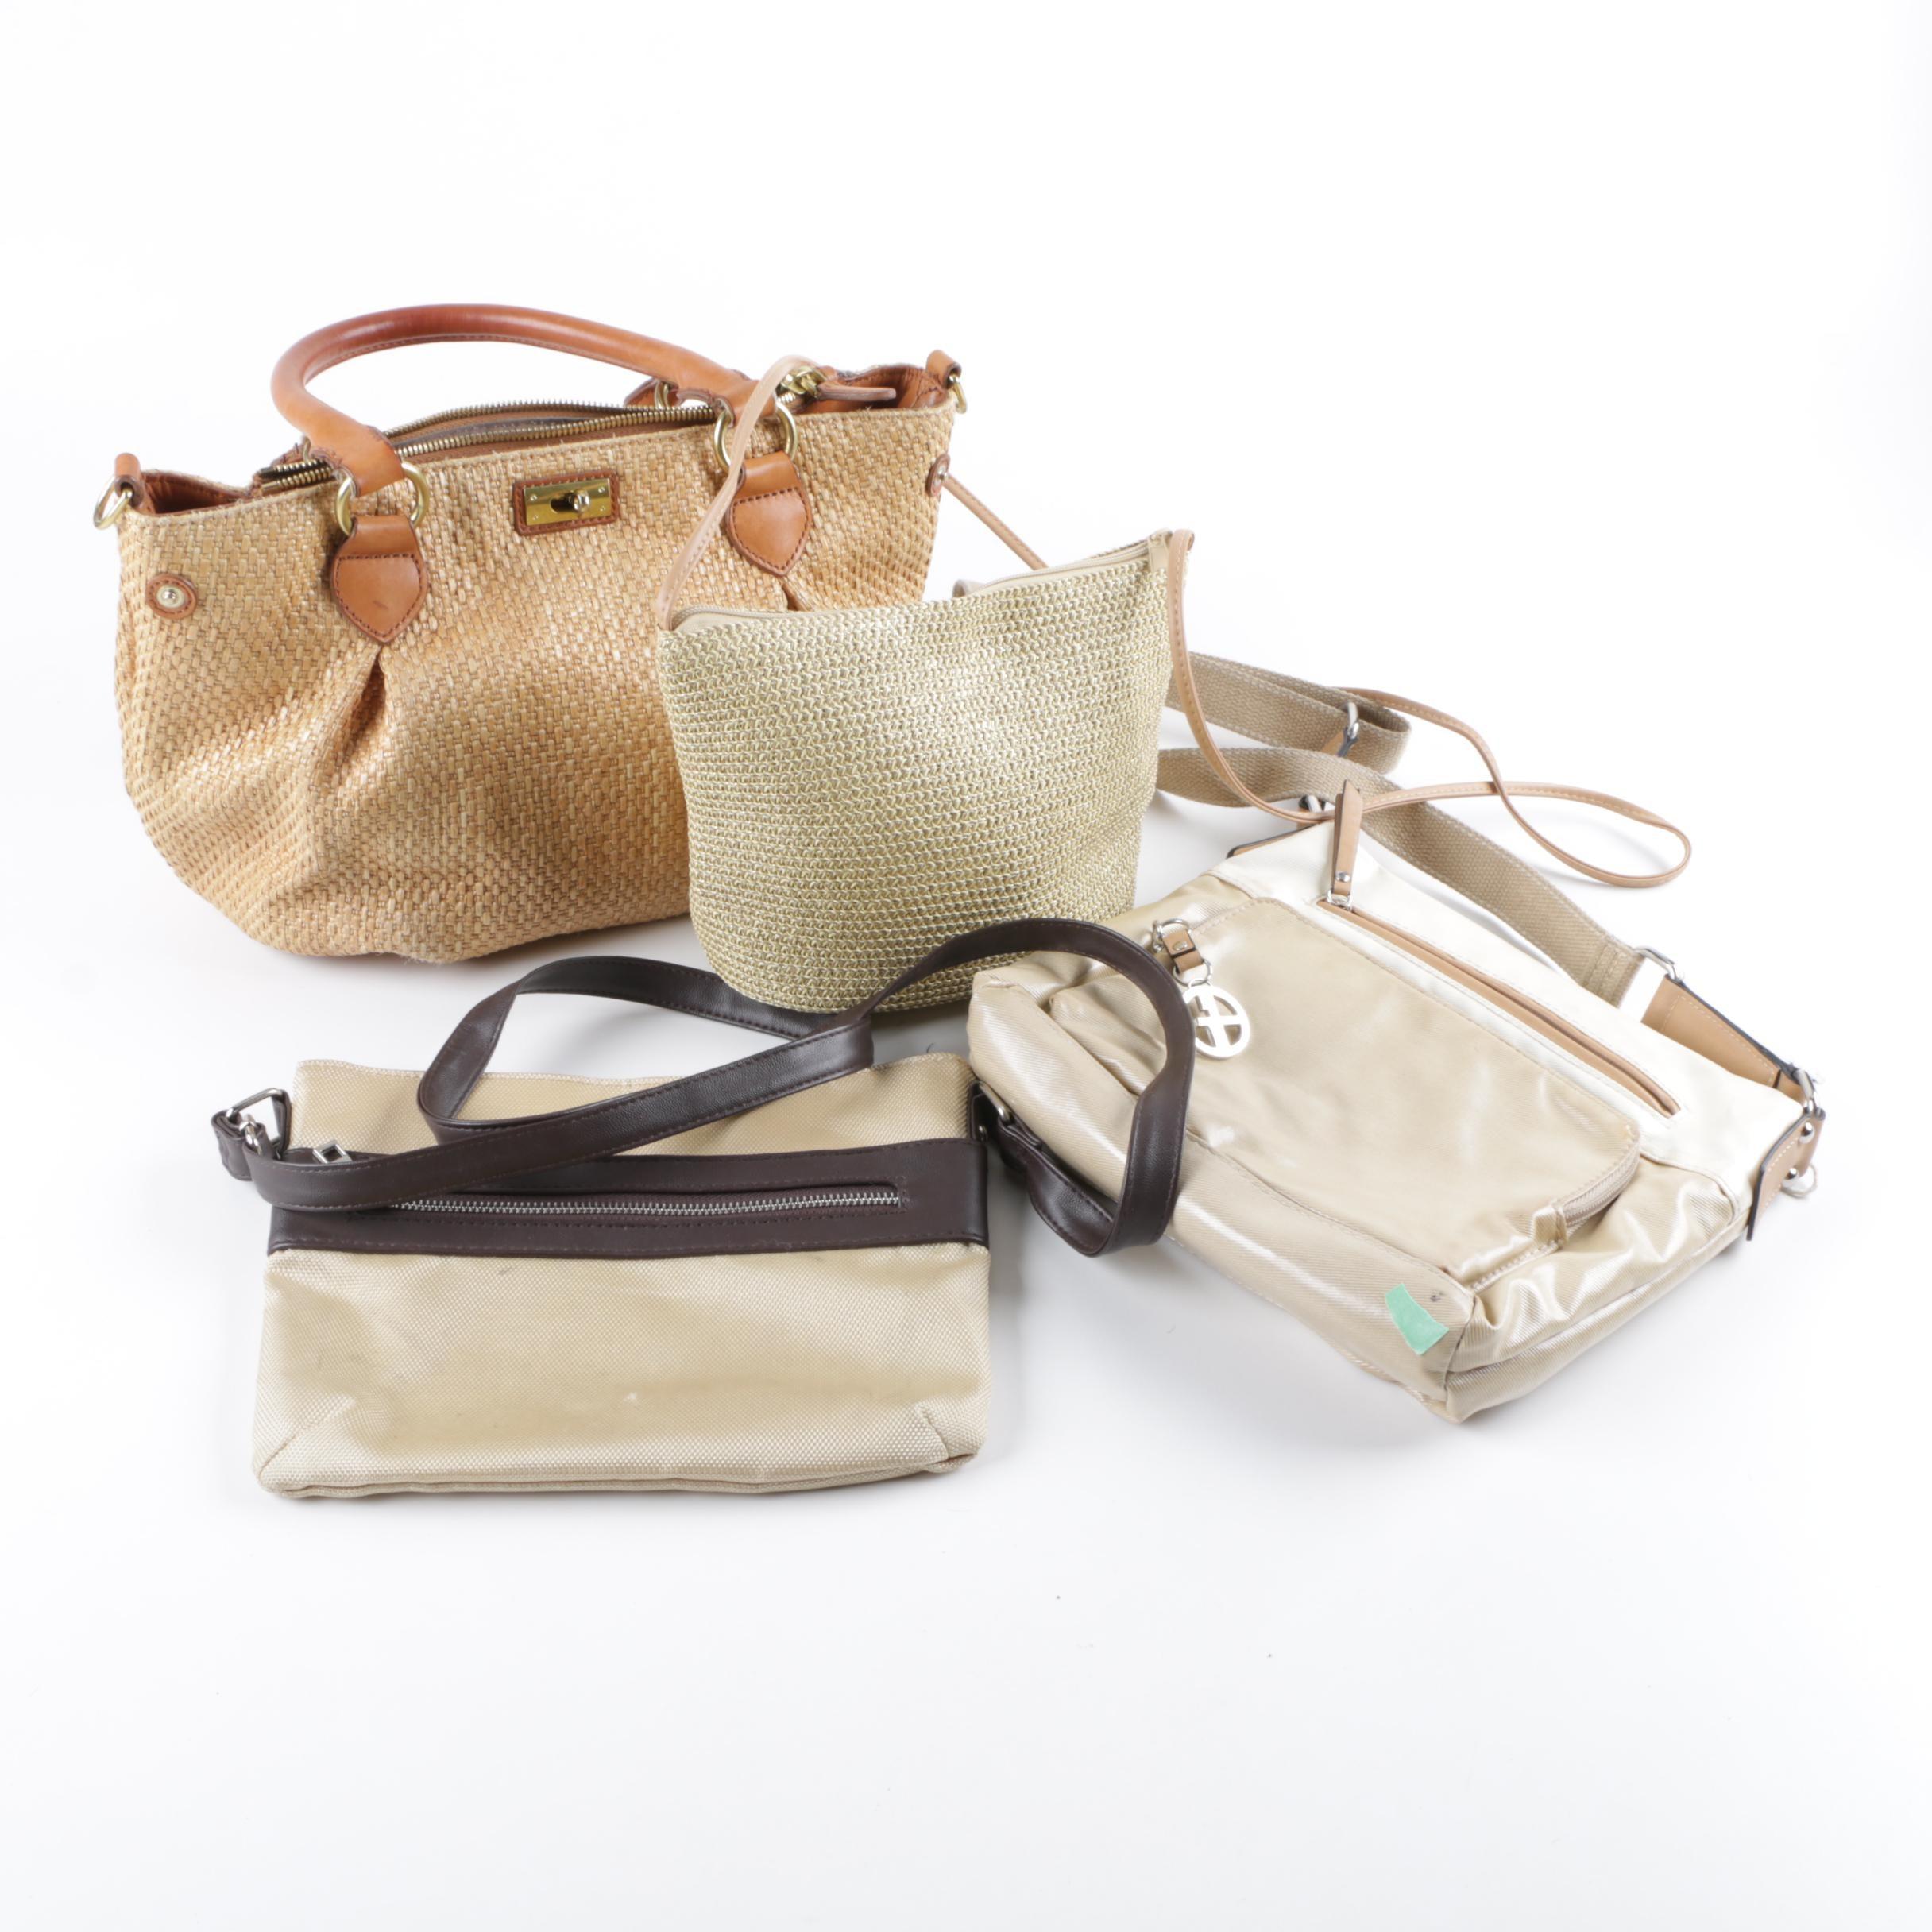 Handbags Including J. Crew, Giani Bernini and Funny Girl